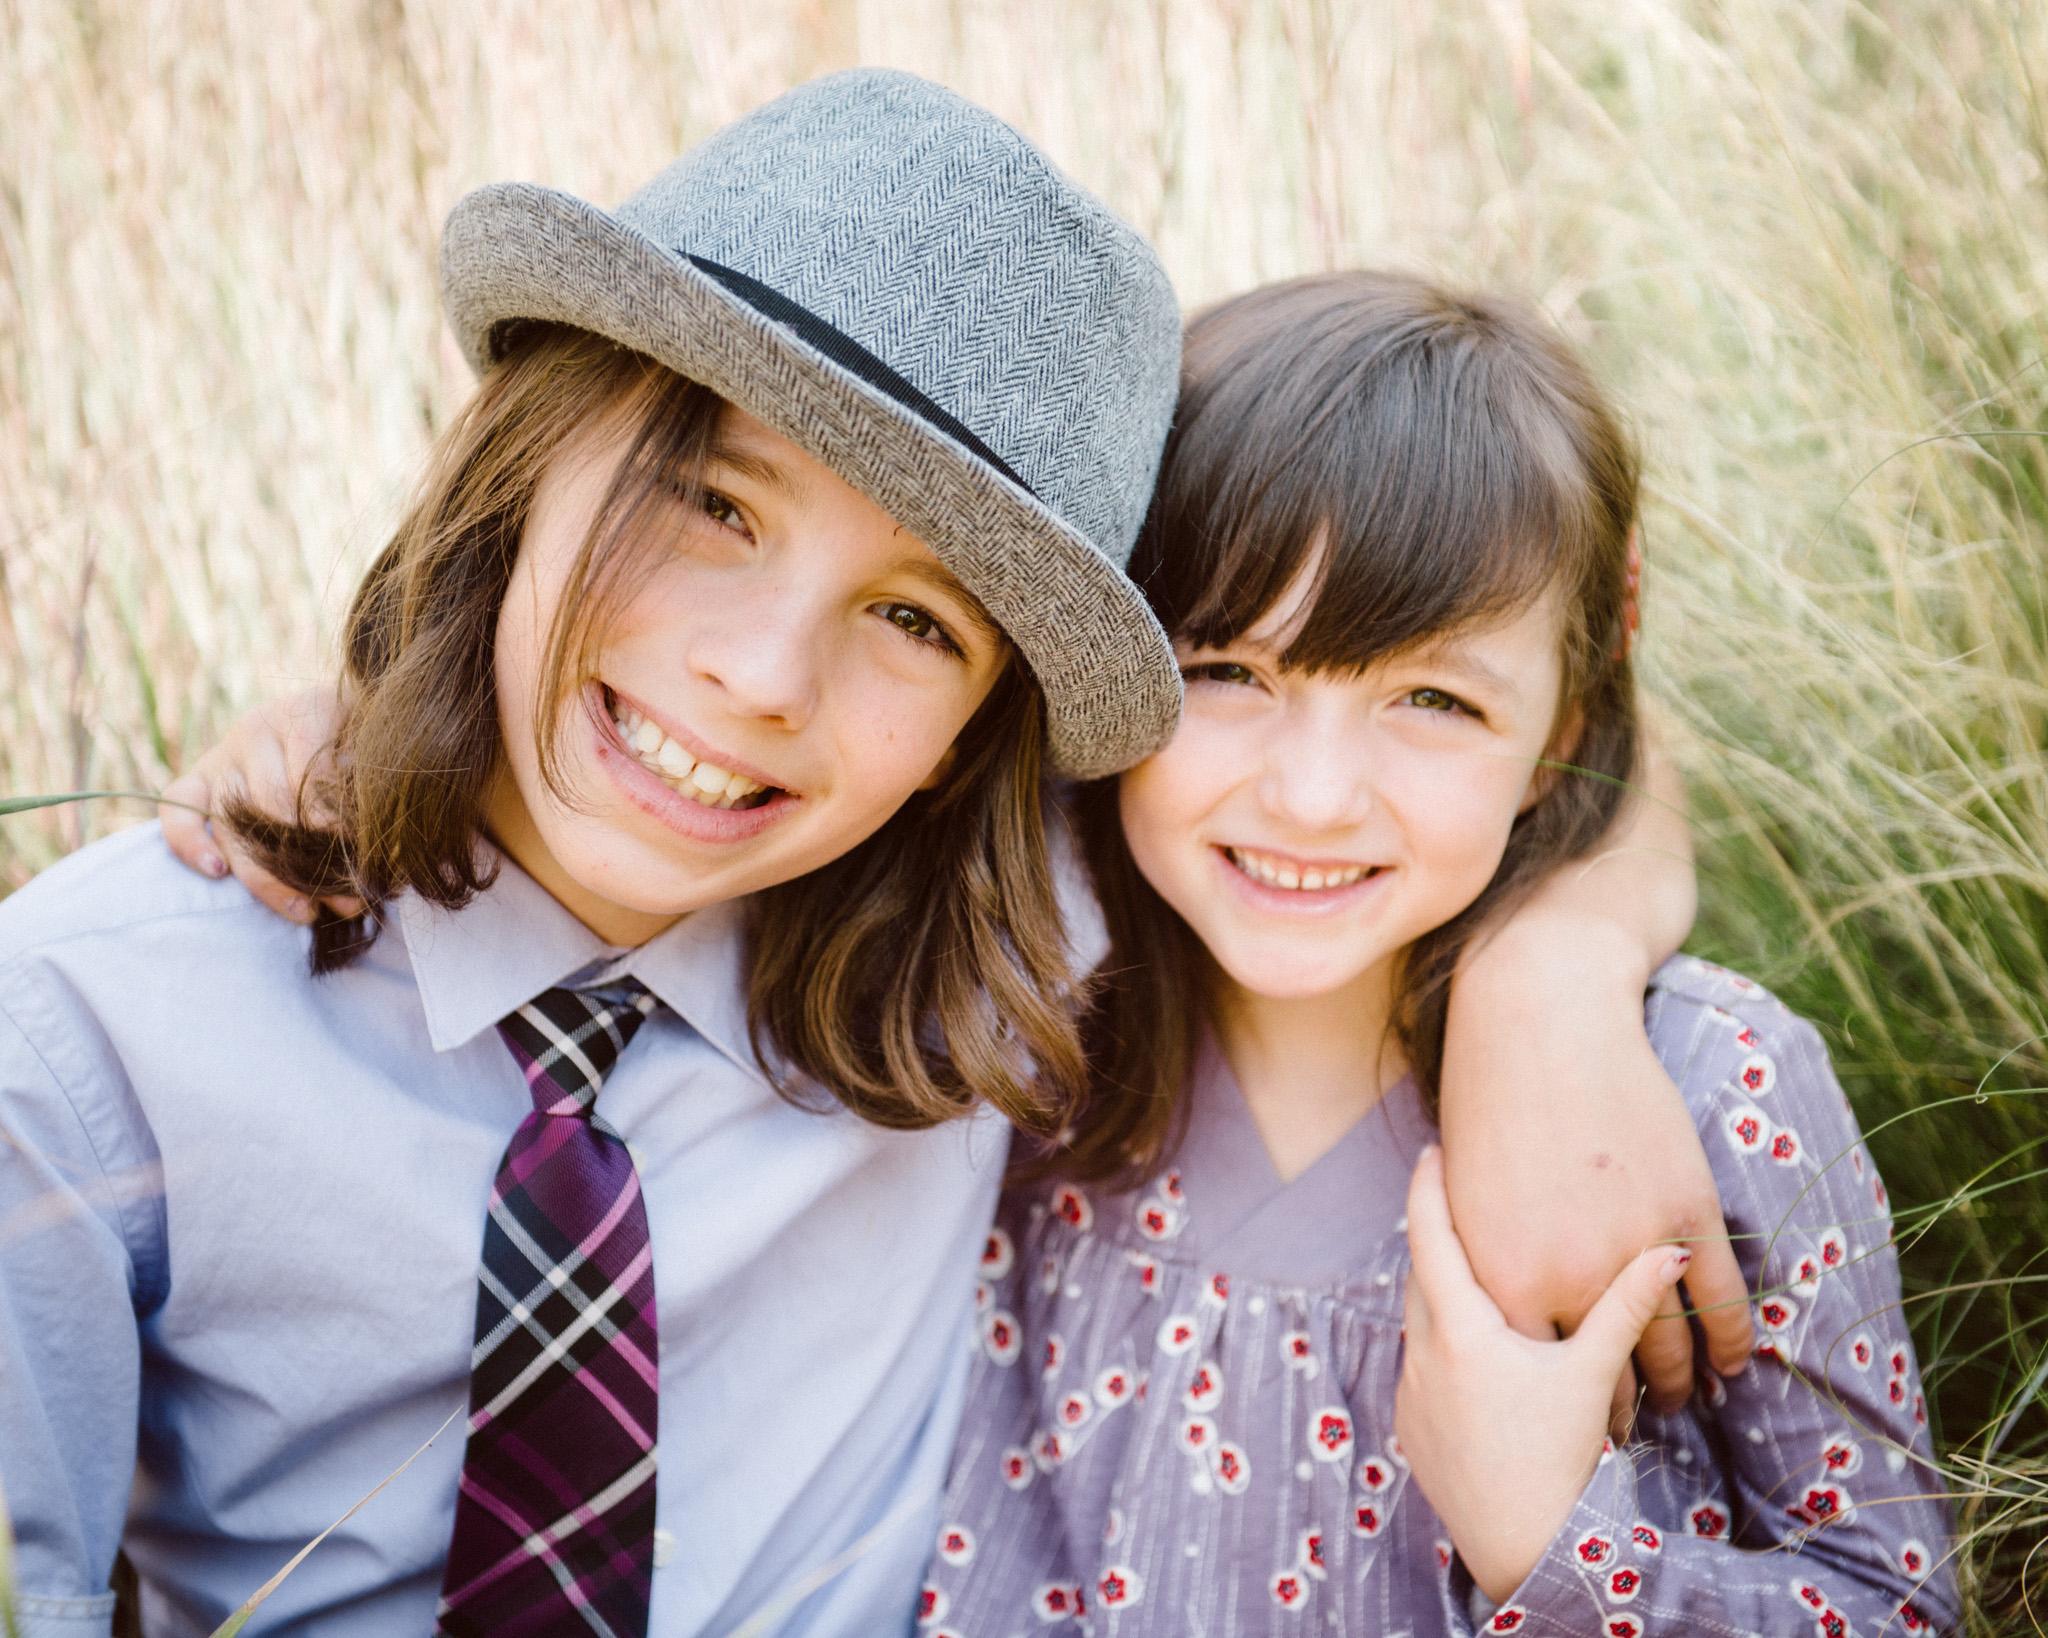 Denver-back-to-school-portraits-1-2.jpg